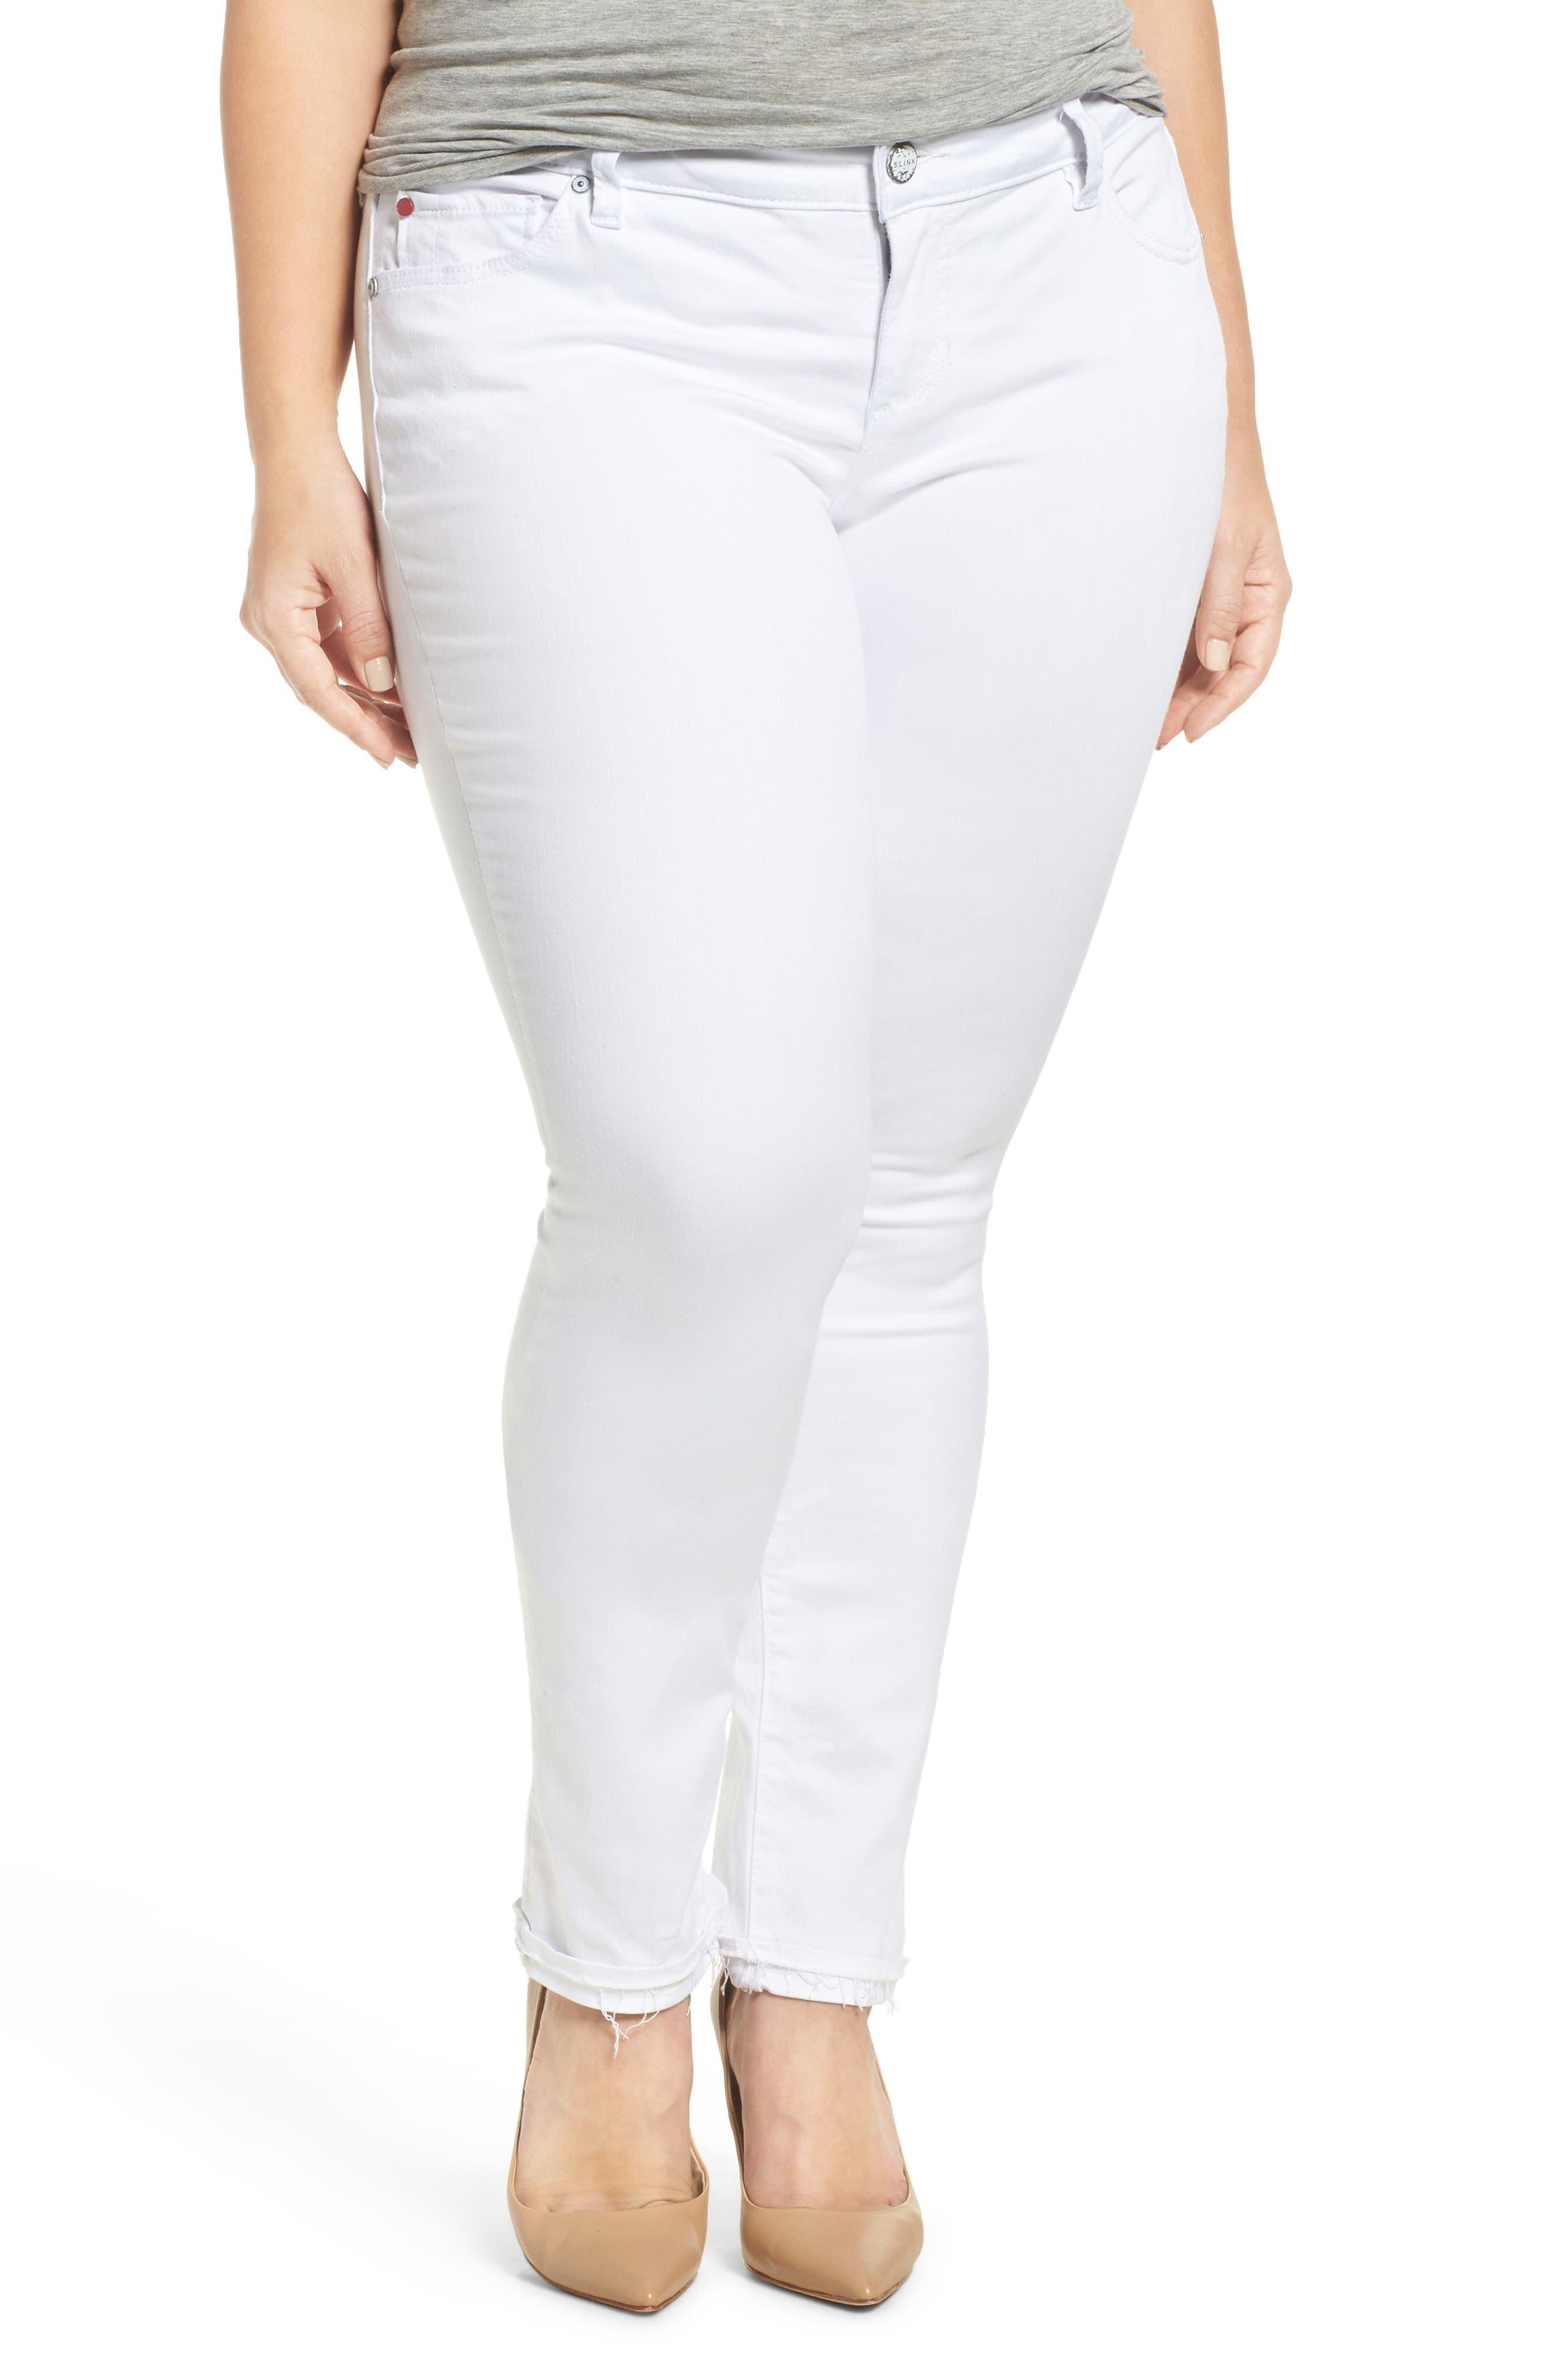 SLINK Jeans Release Hem Skinny Jeans (Lexy) (Plus Size)